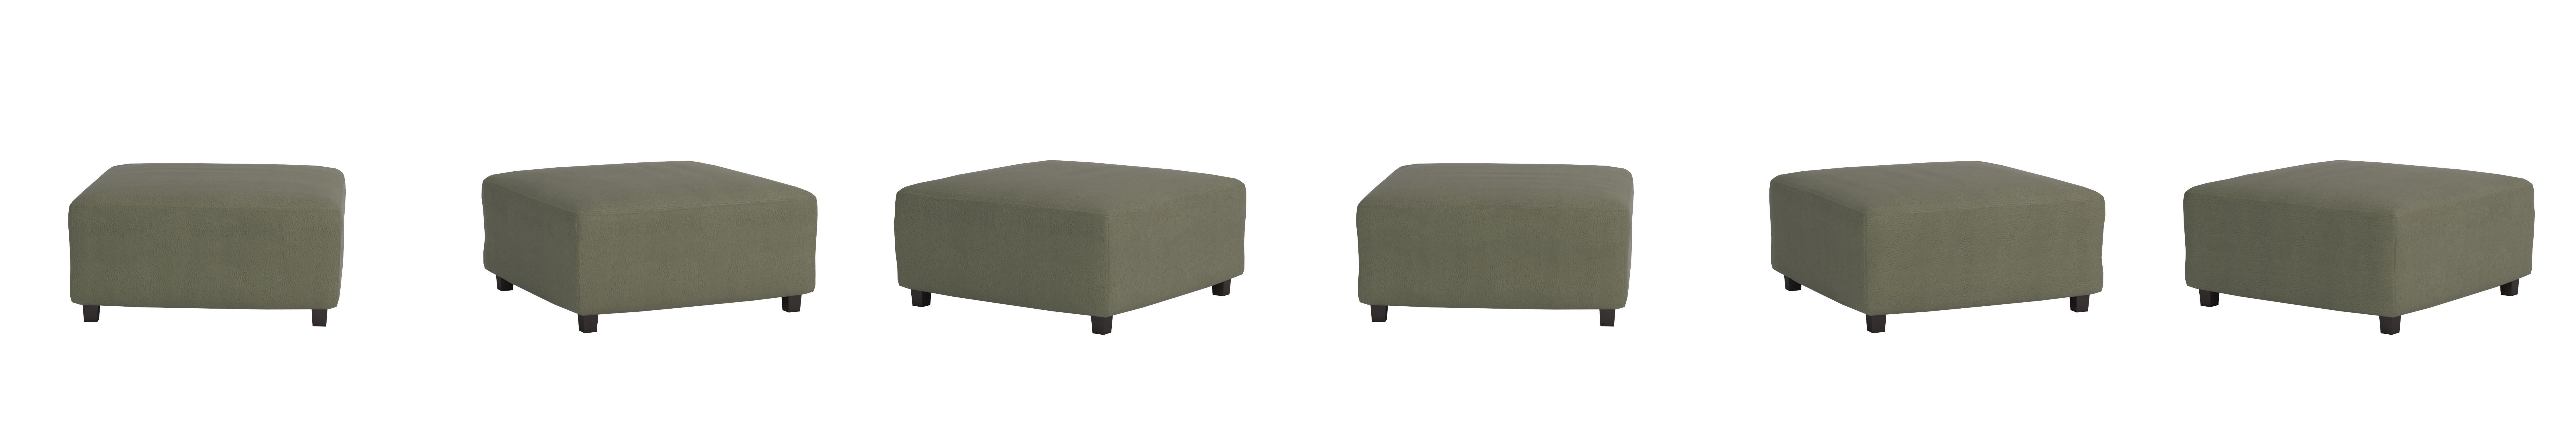 Amazon Ashley Furniture Signature Design Jessa Place